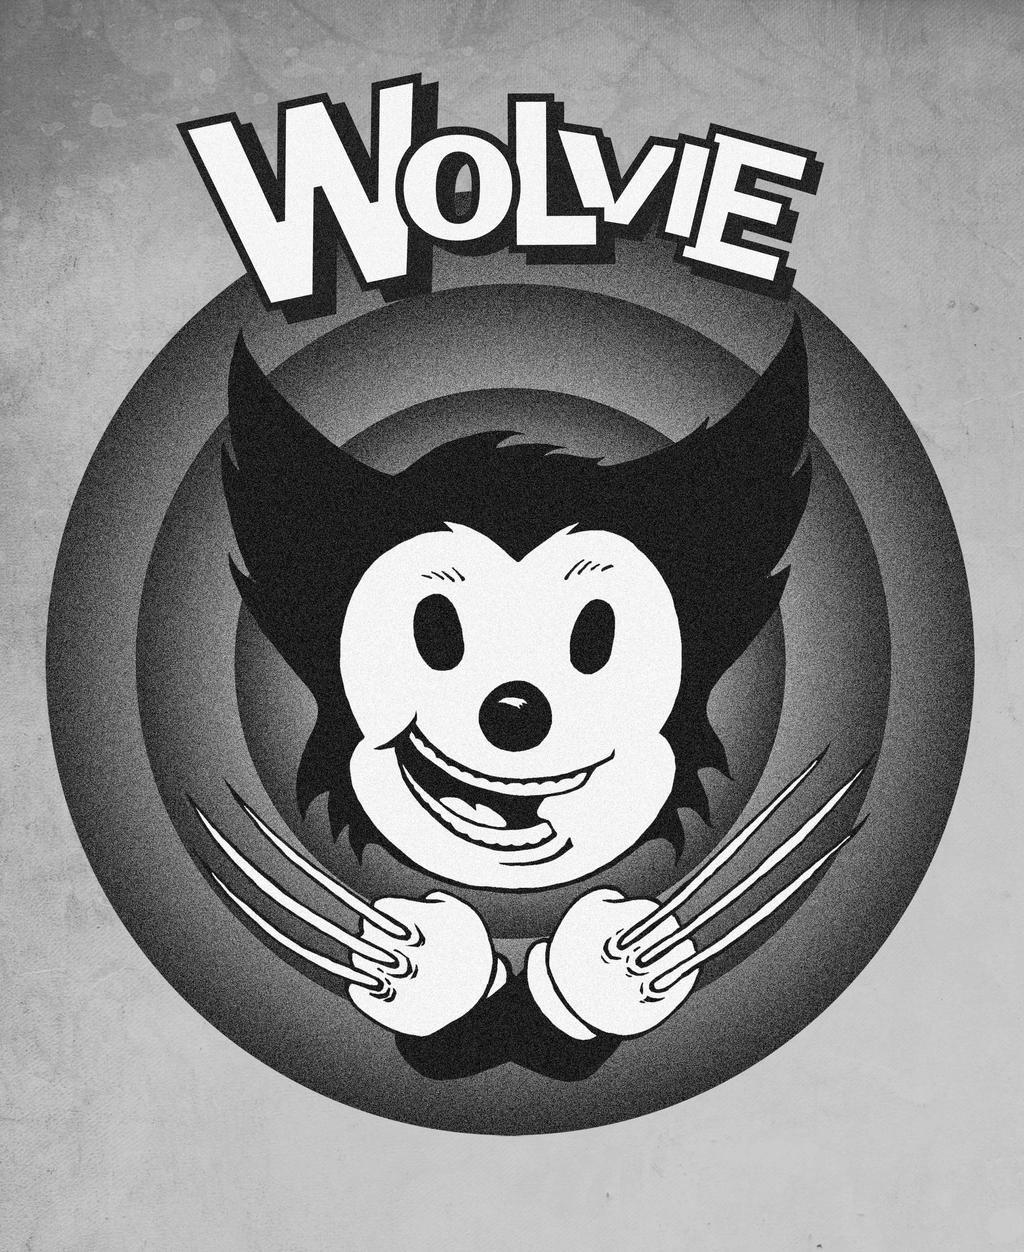 Wolvie by komus